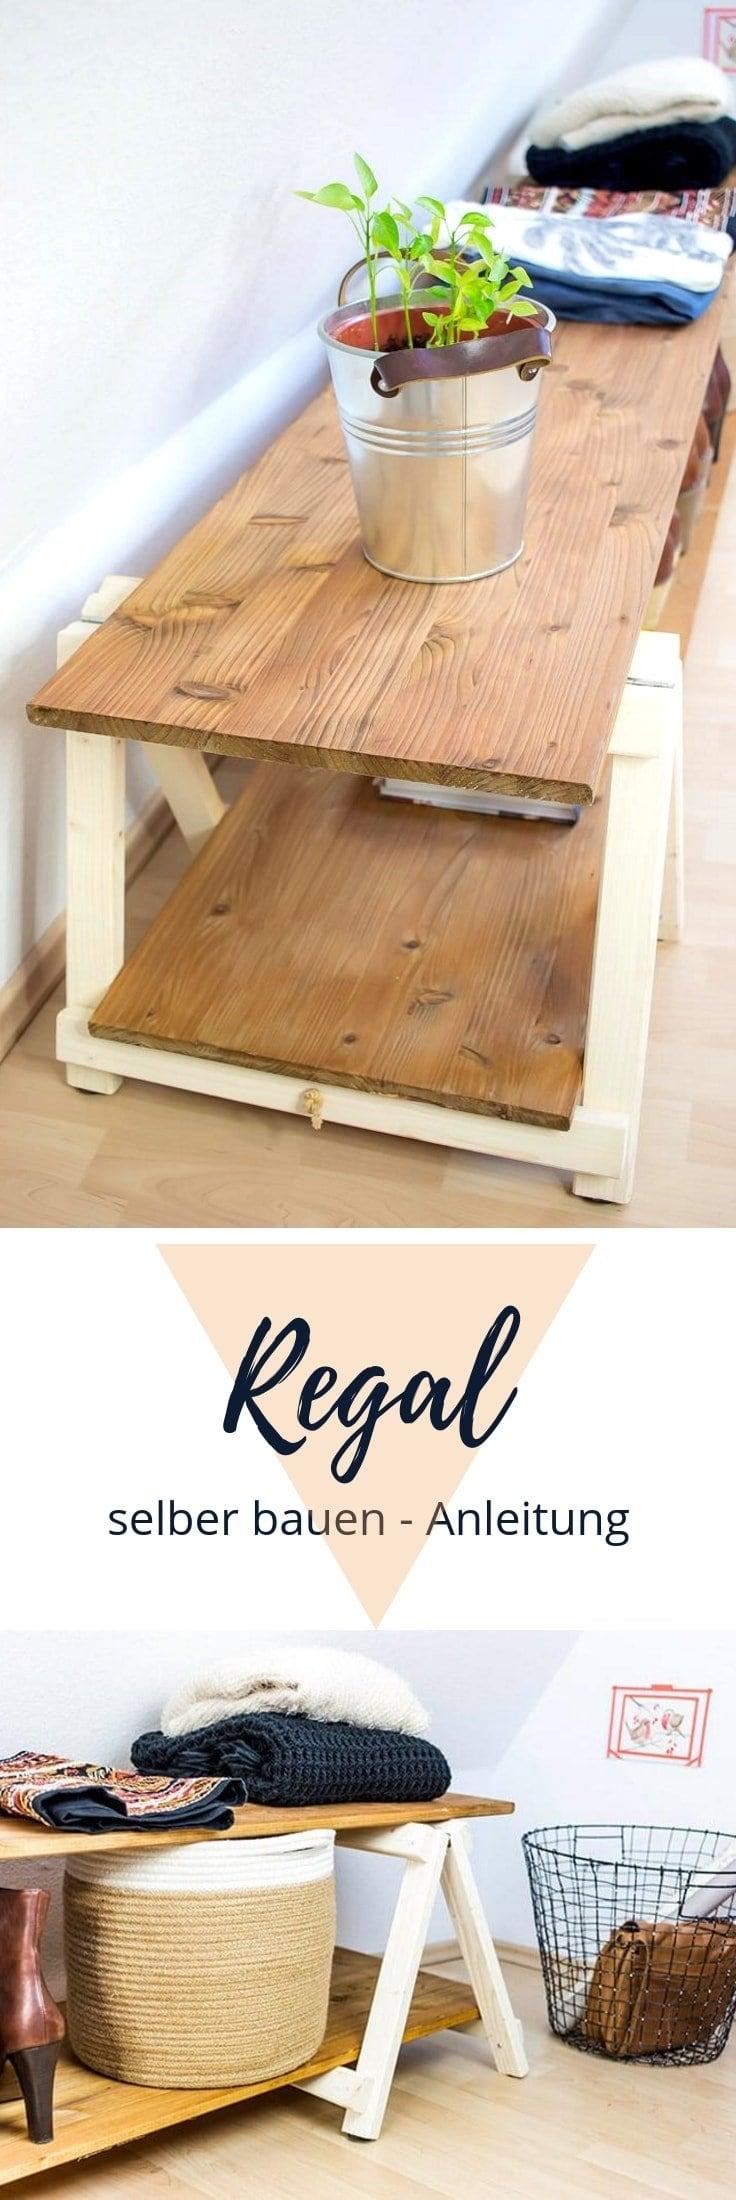 DIY Regal Anleitung